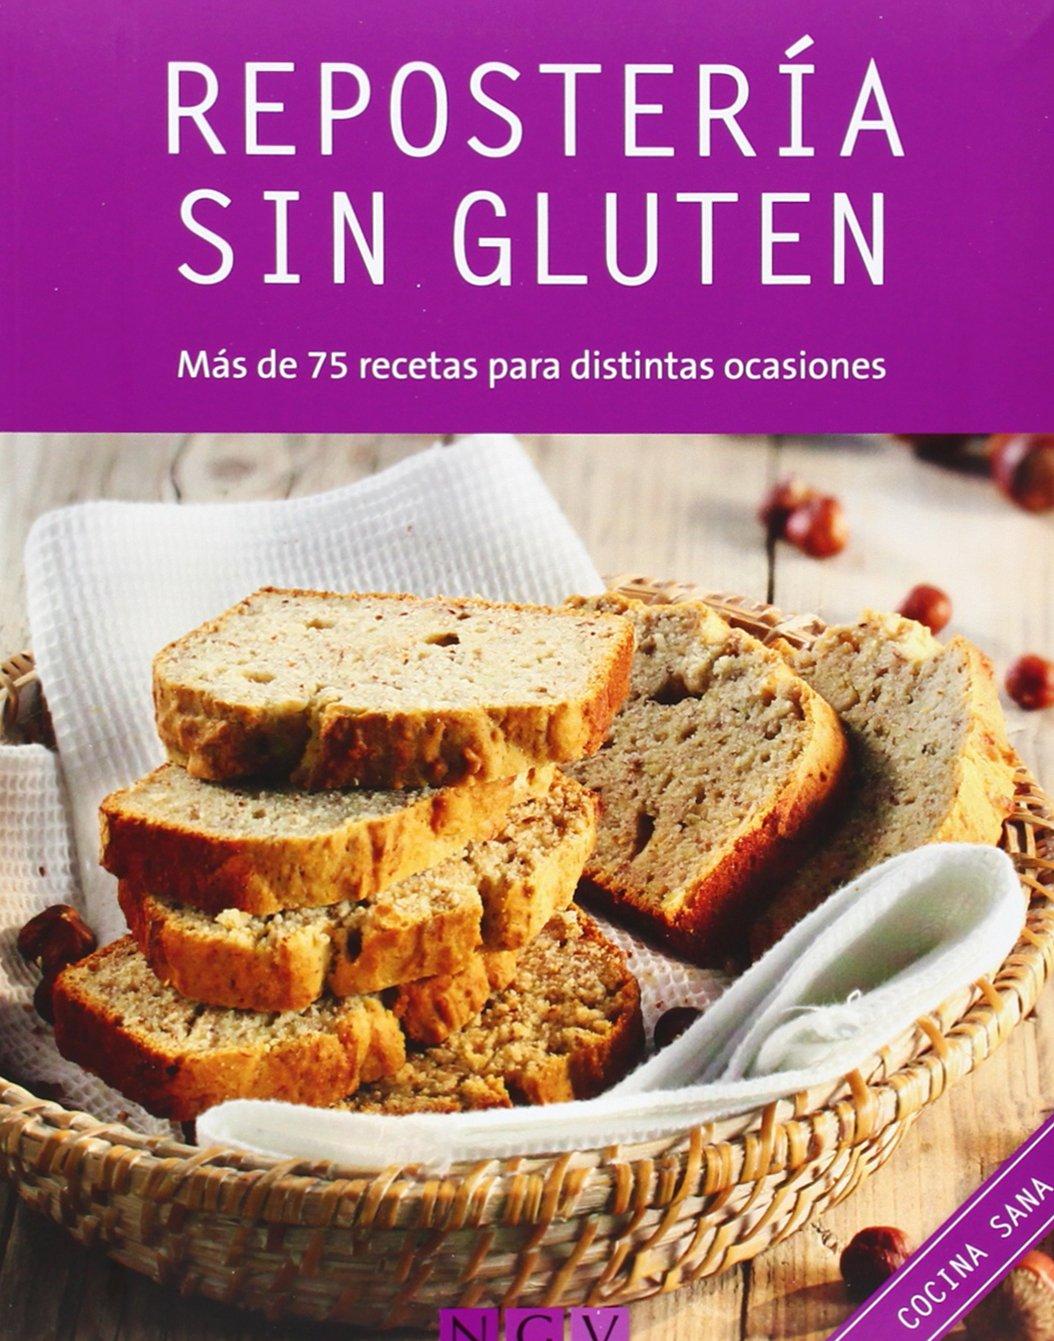 Repostería Sin Gluten (Cocina sana): Amazon.es: Annerose ...